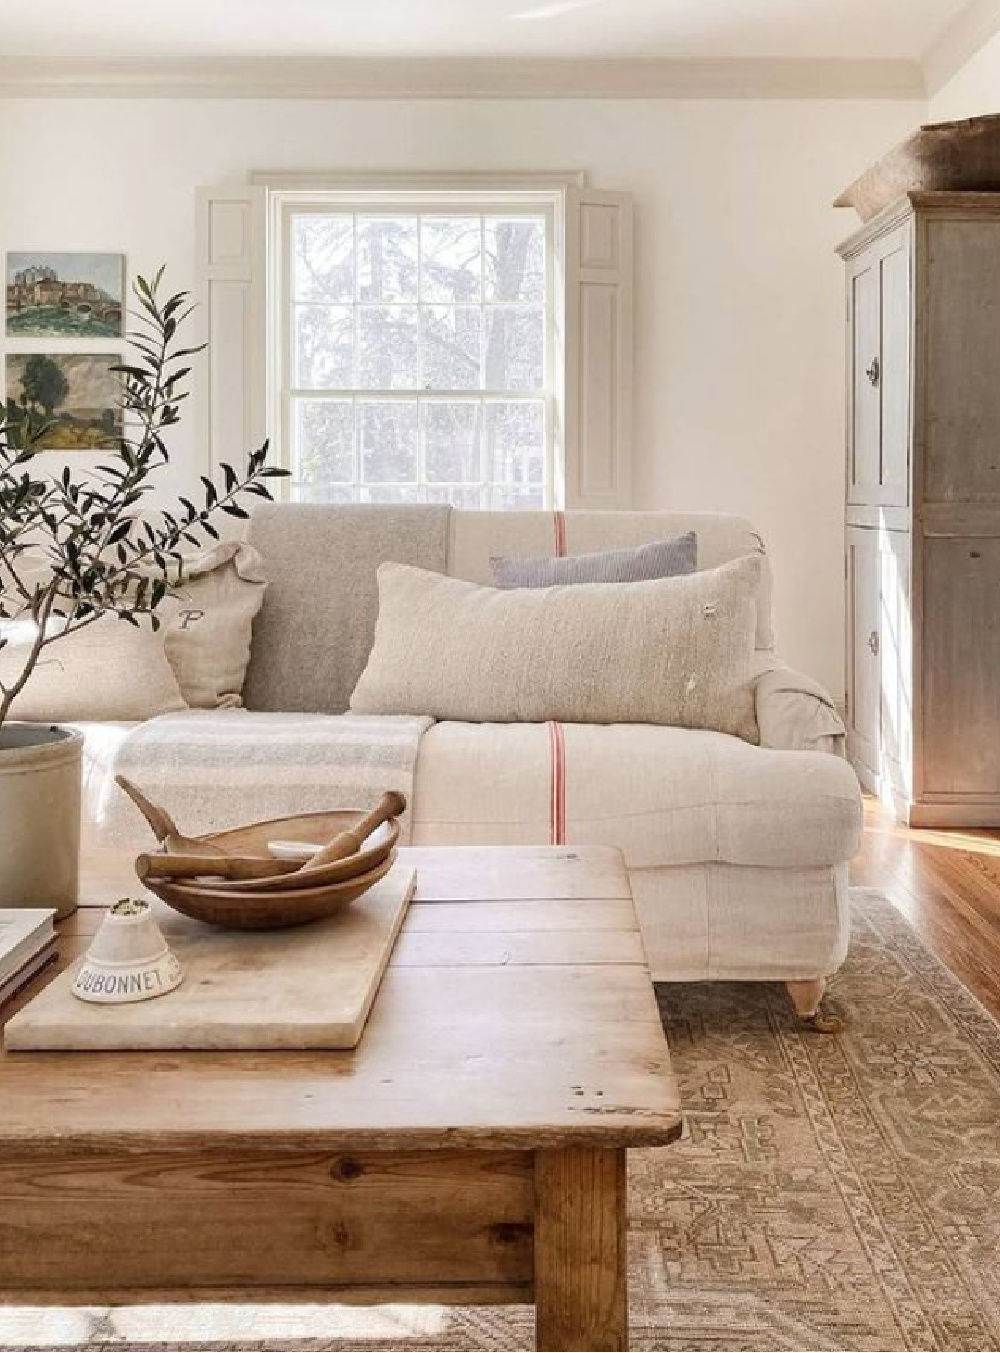 Understated and serene neutral interior with nubby linen sofa and putty shutters - @burtsbrisplease. #europeancountry #neutraldecor #belgianstyle